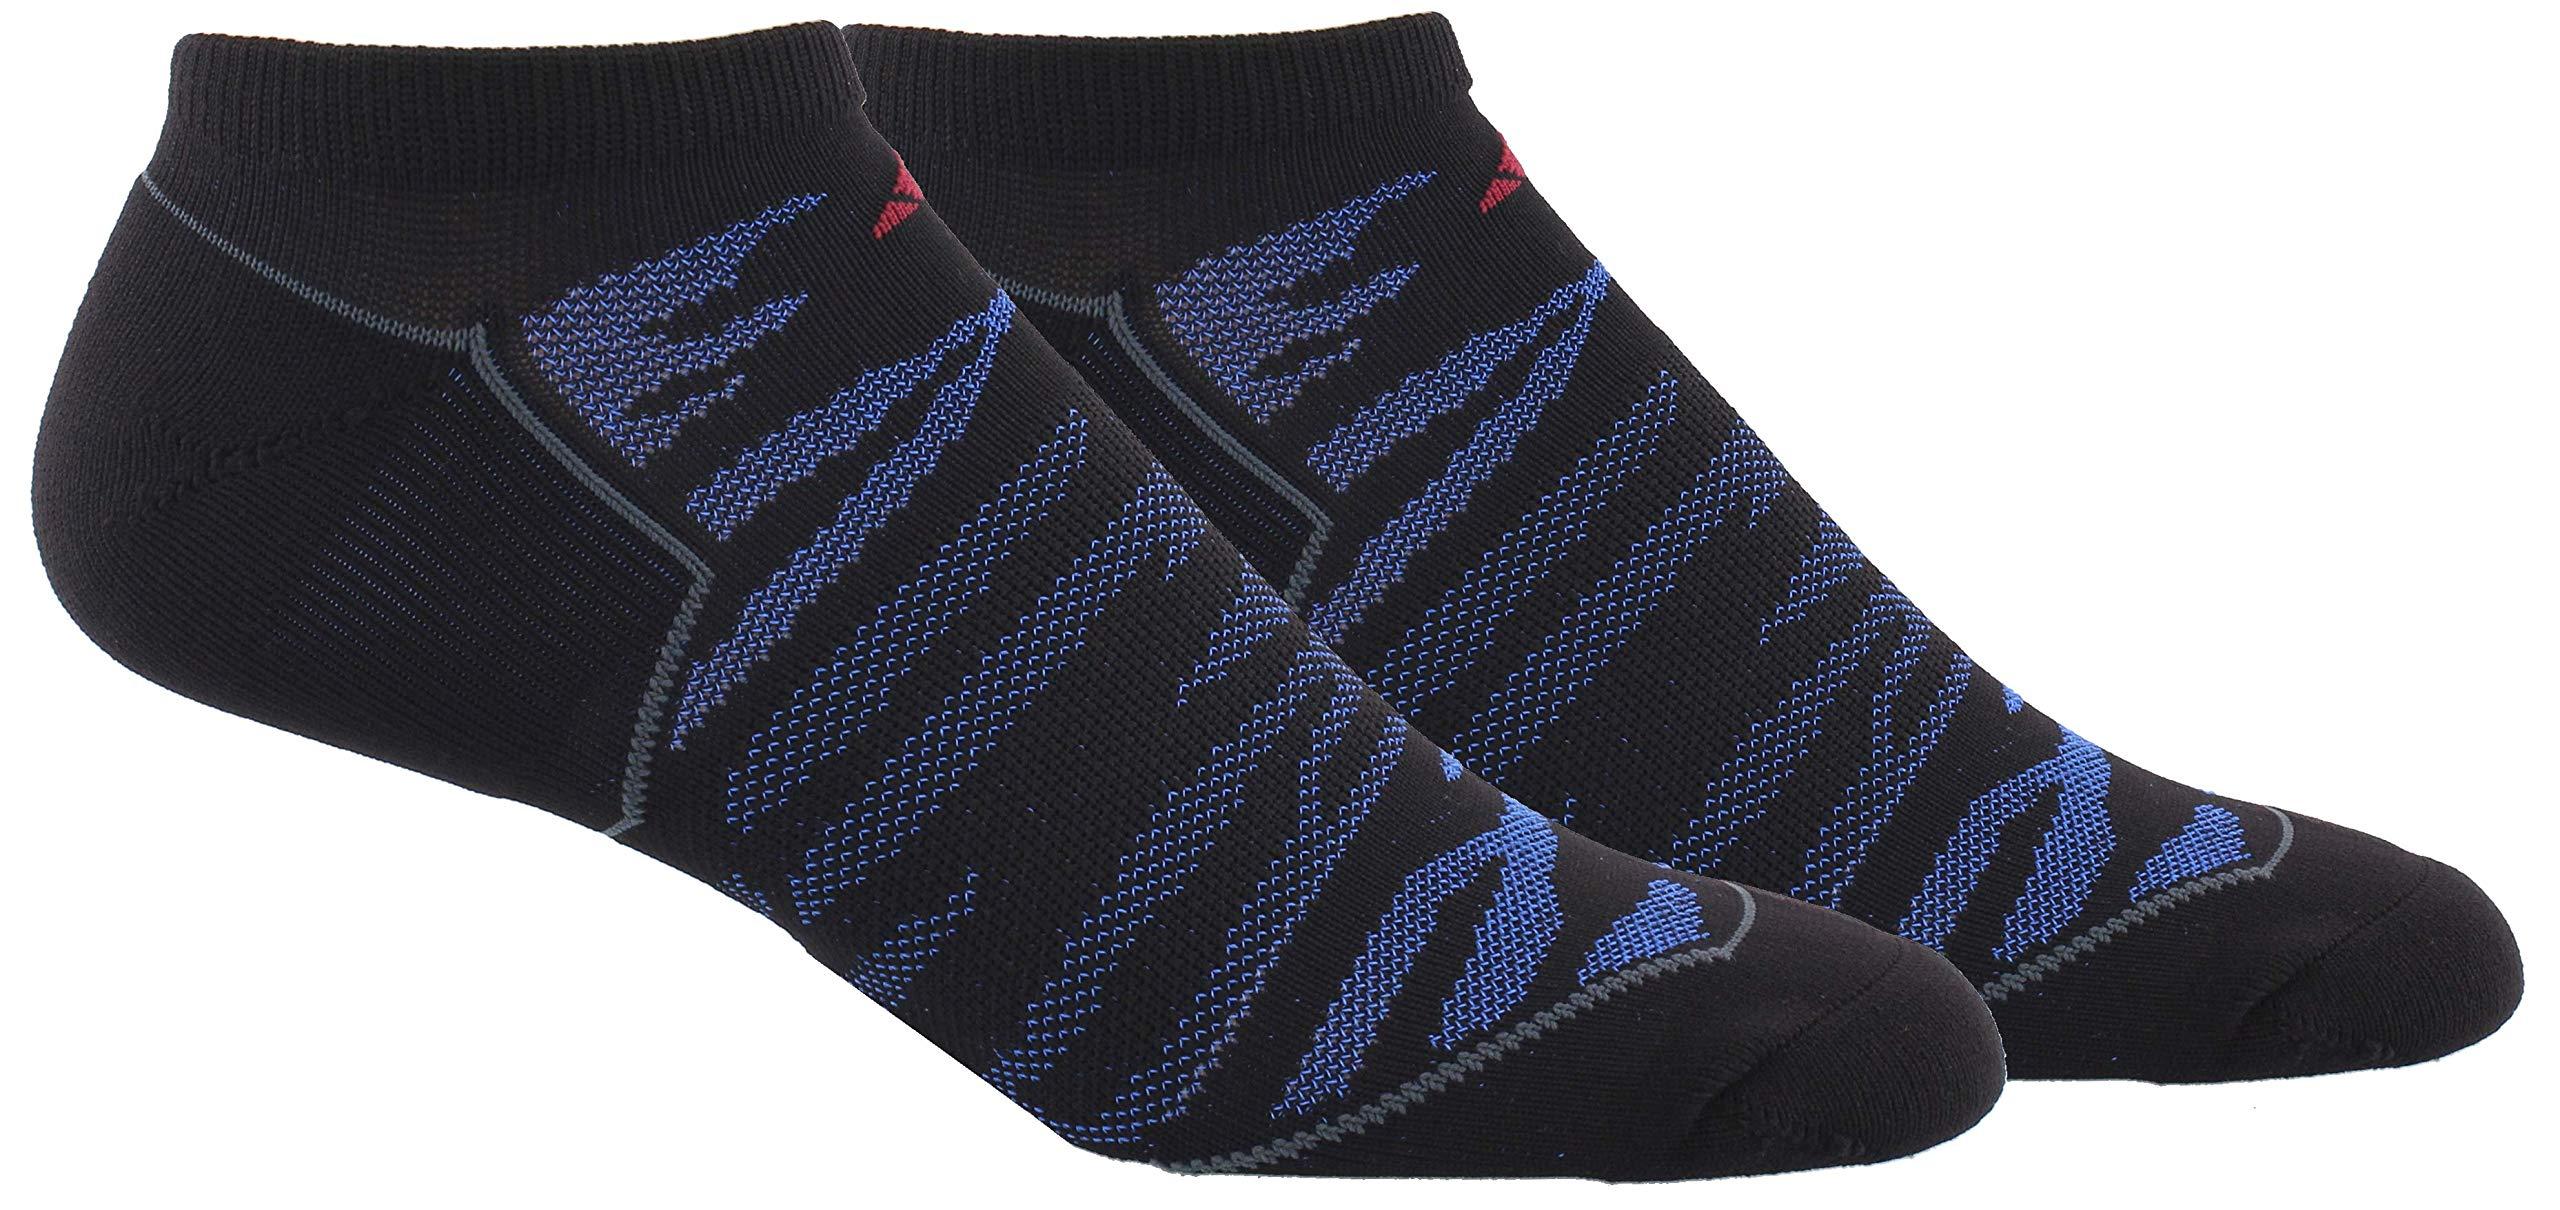 adidas Men's Superlite Prime Mesh No Show Sock (2-Pair), Black/Blue/Dark Grey/Collegiate Burgundy, Large, (Shoe Size 6-12) by adidas